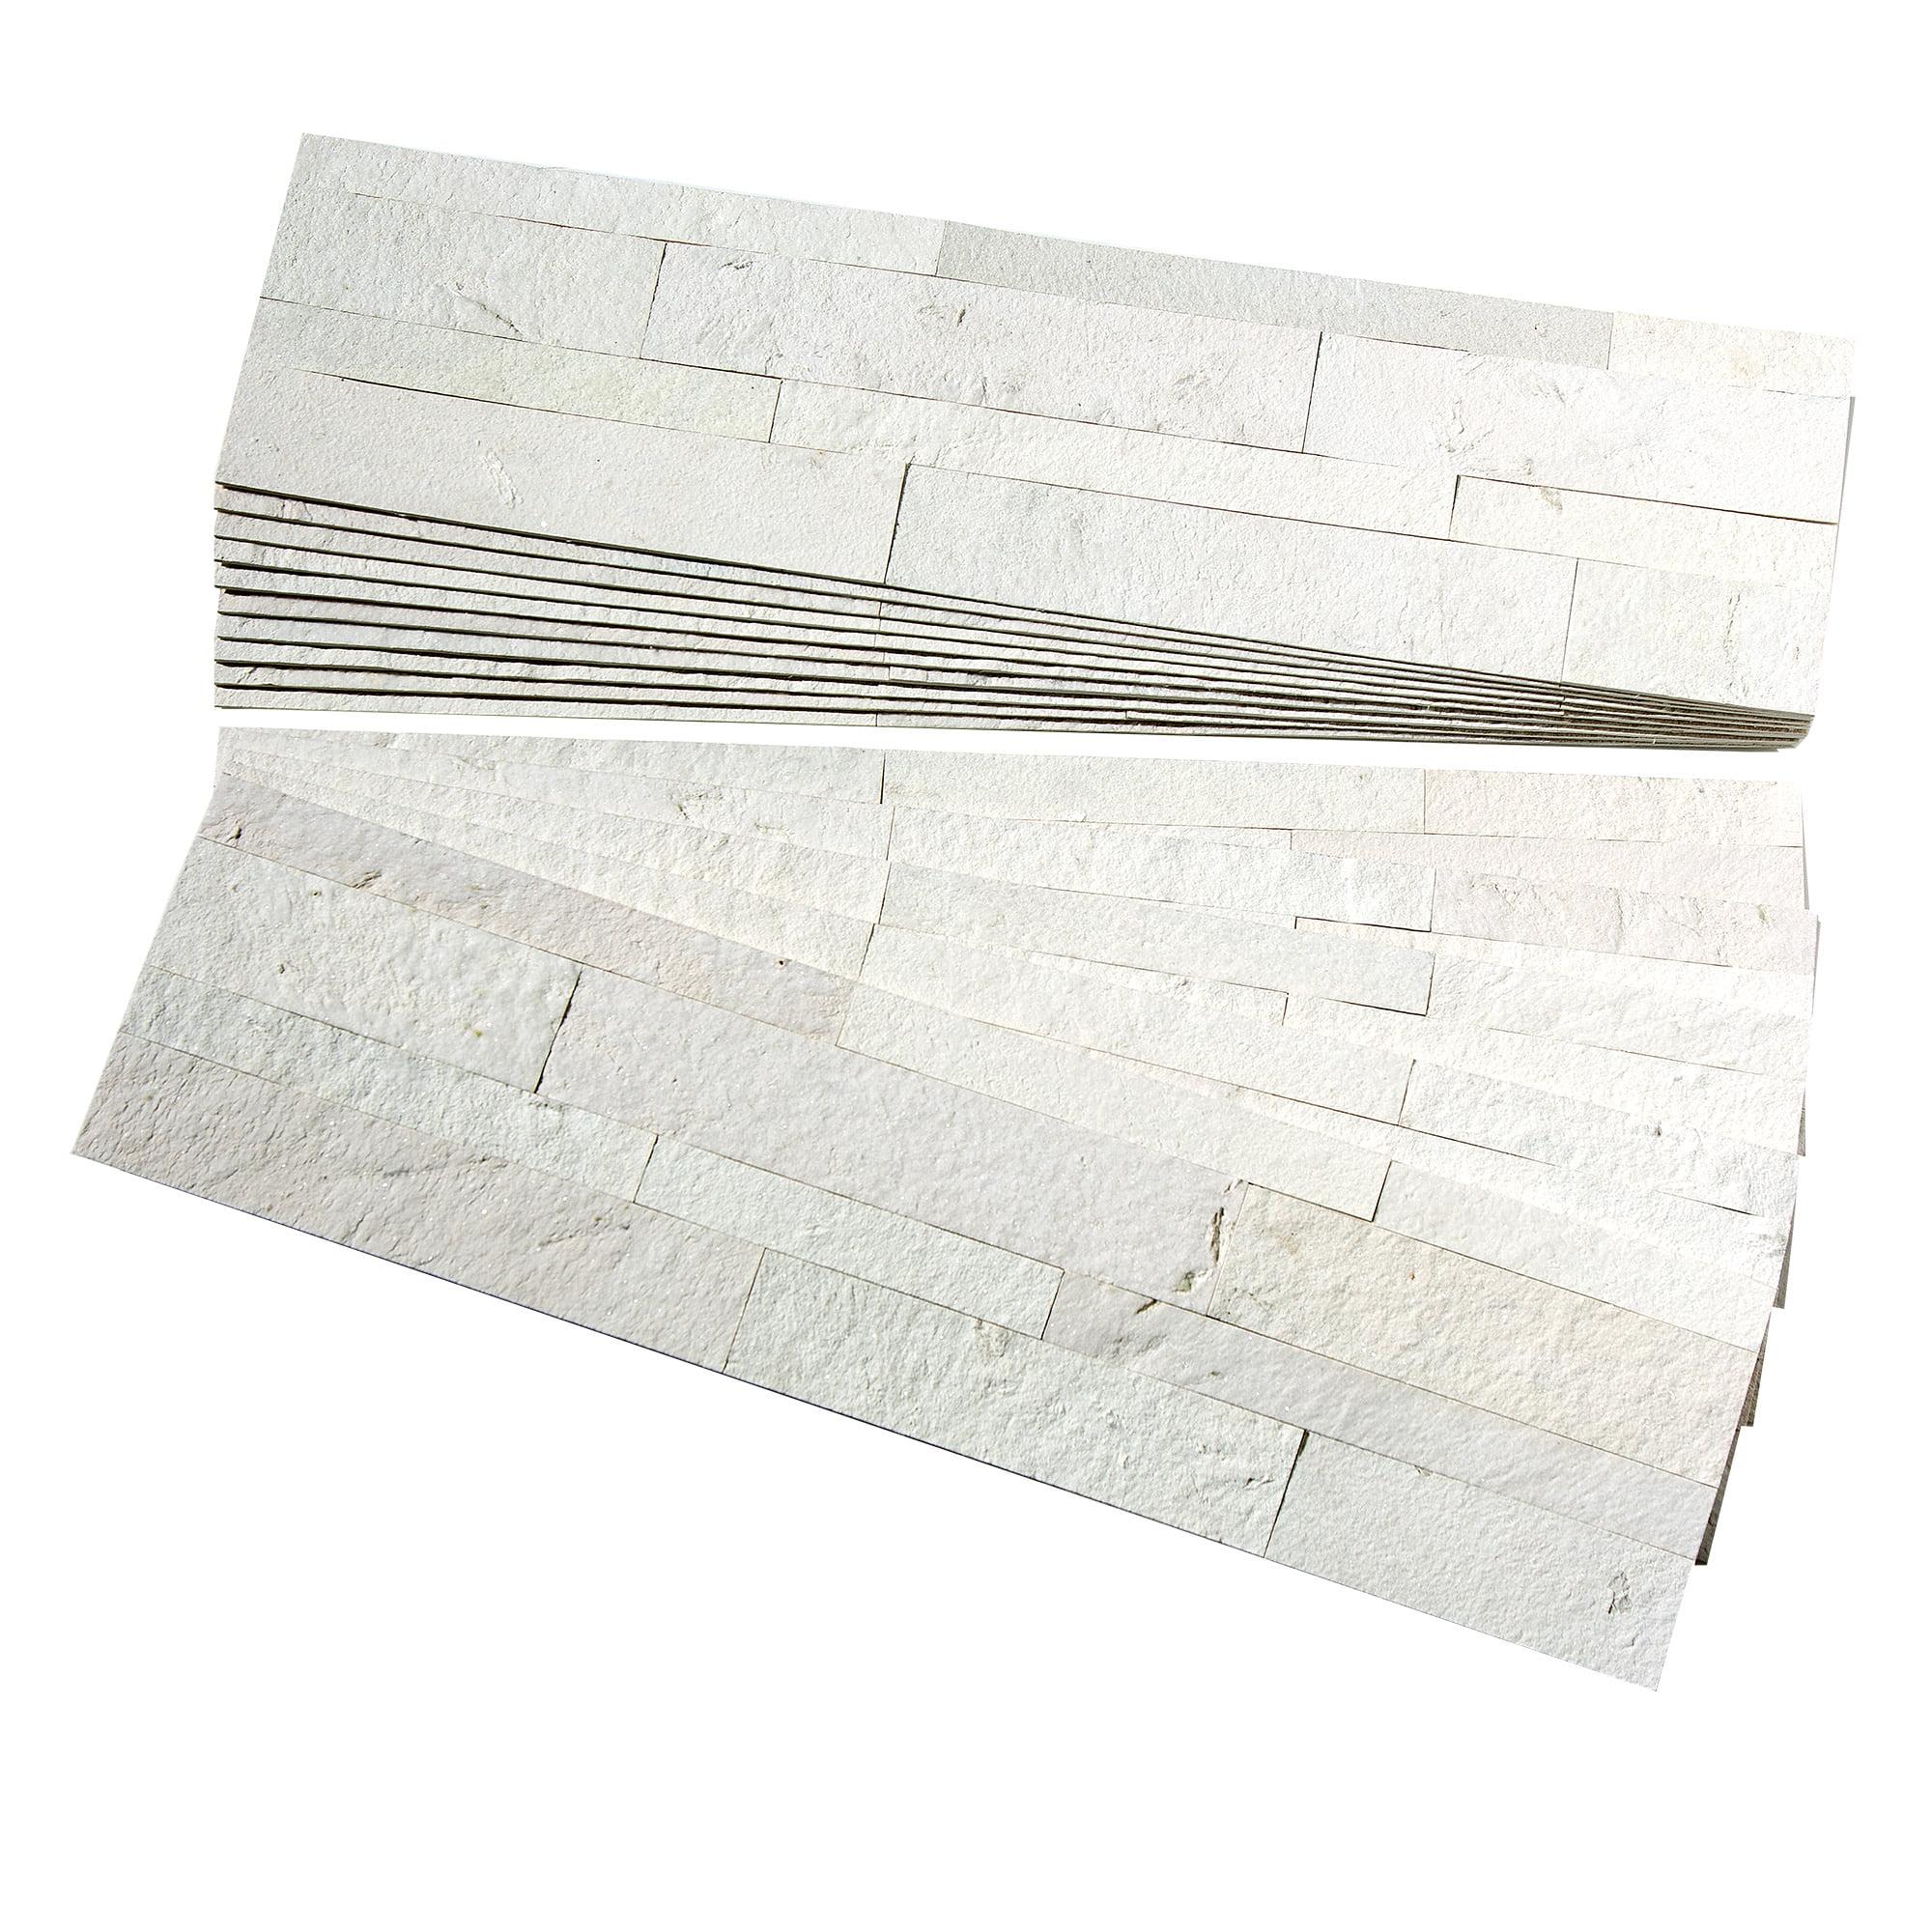 aspect peel and stick stone overlay kitchen backsplash ivory marble approx 15sq ft kit